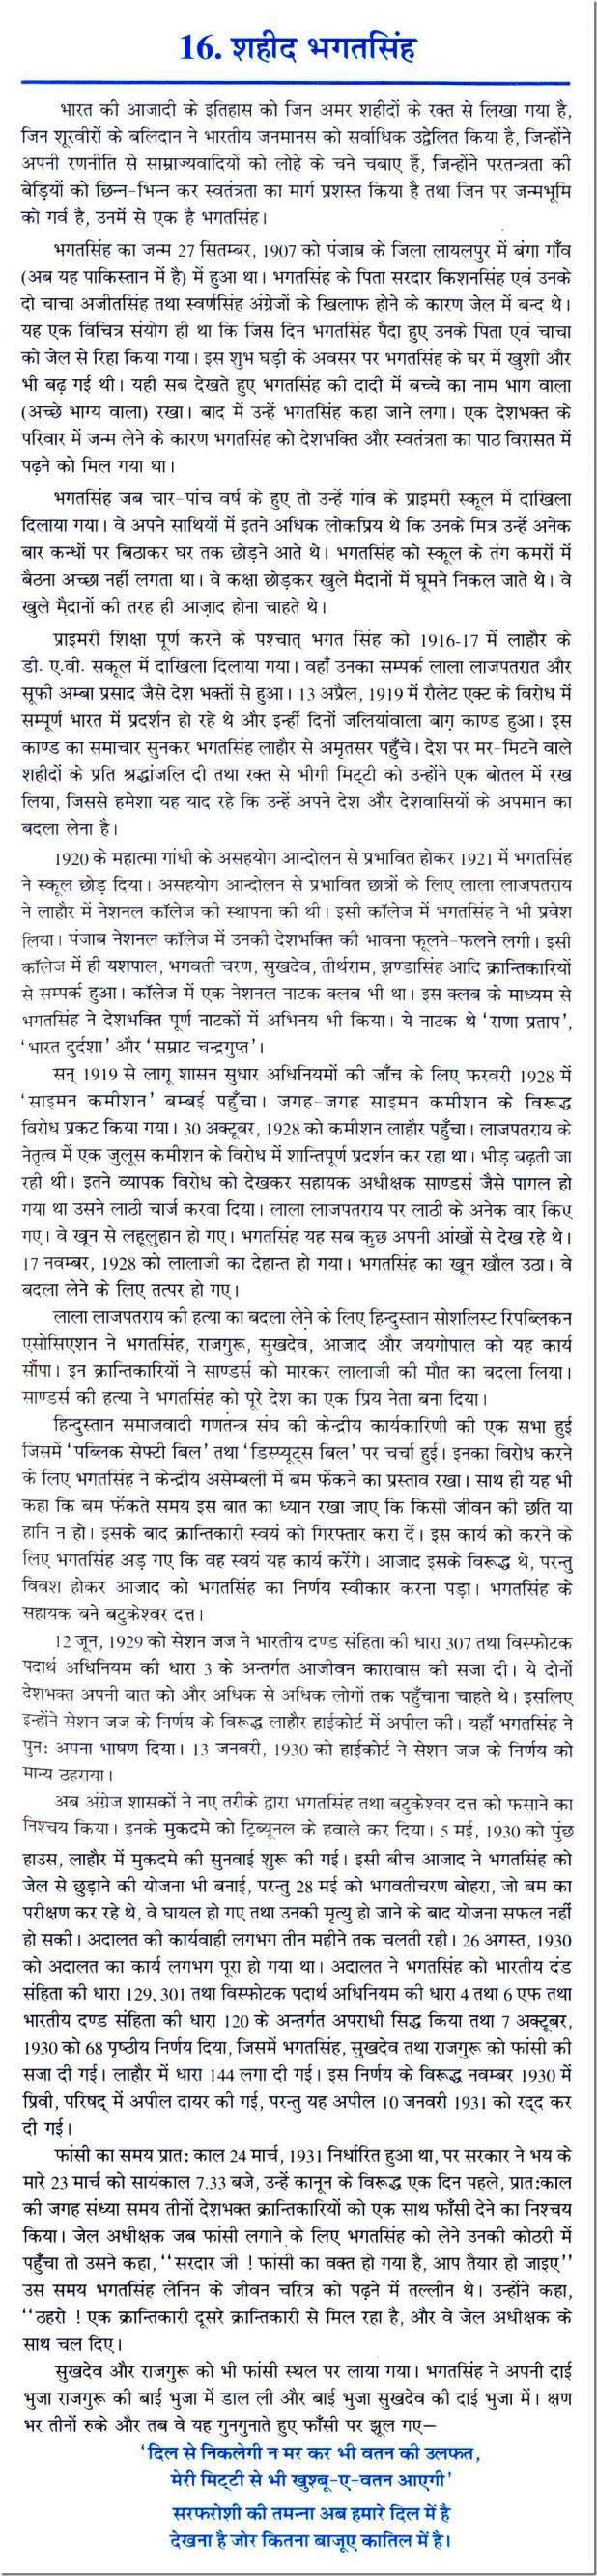 021 Hindi Essay Bhagat Singh Thumb On In Sanskrit English Words Short Punjabi Language Marathi Kannada Telugu Urdu 618x2668 Unique 100 Full